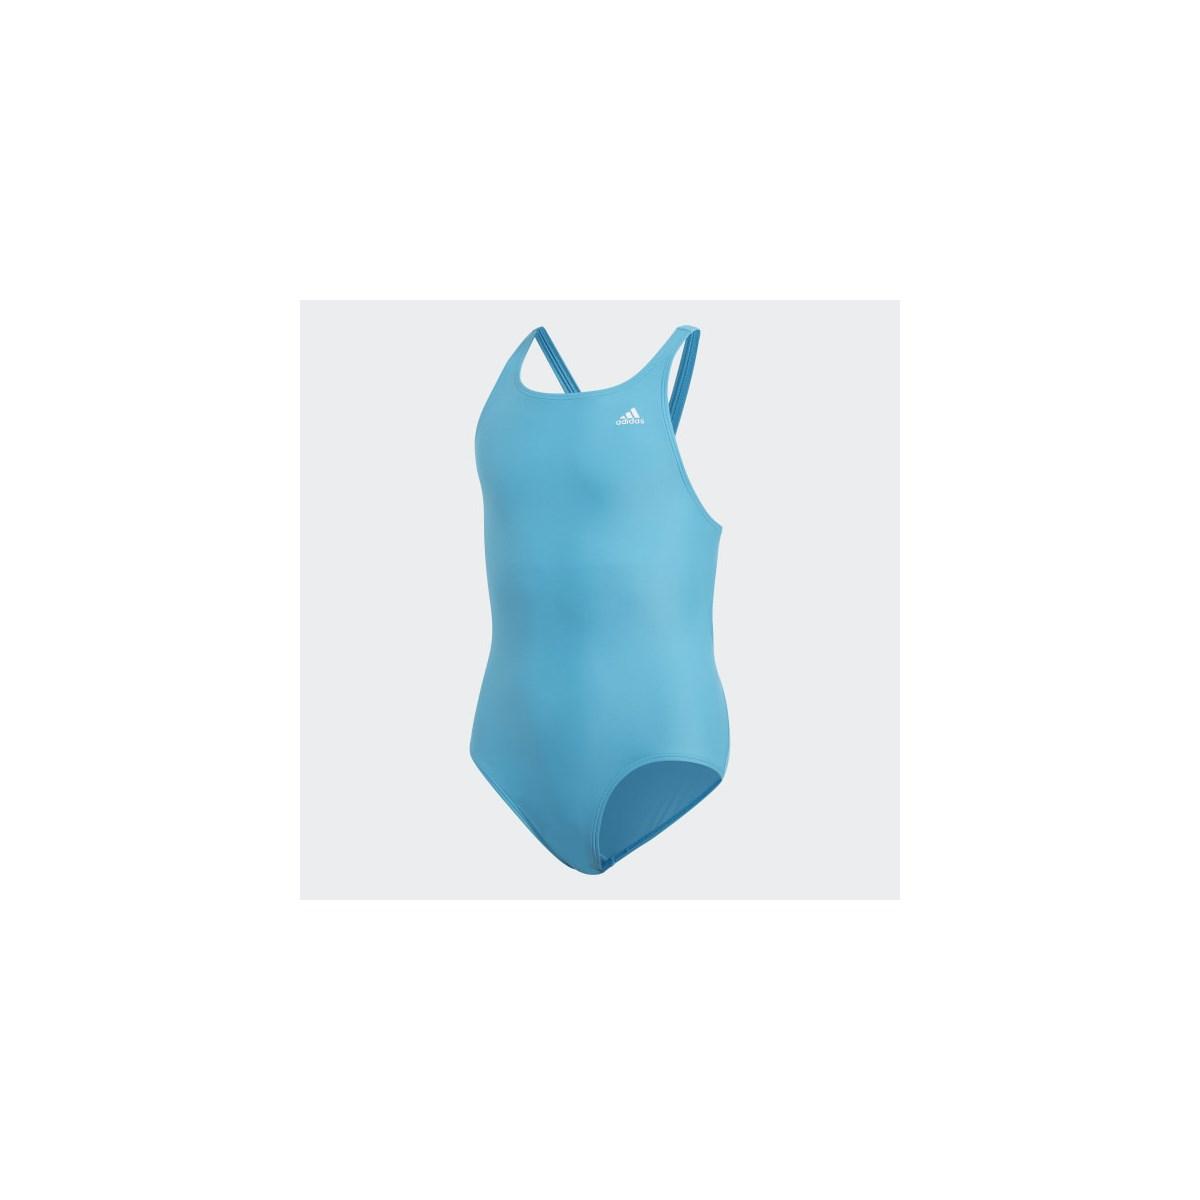 Fit Suit Çocuk Turkuaz Yüzücü Mayosu (FL8664)